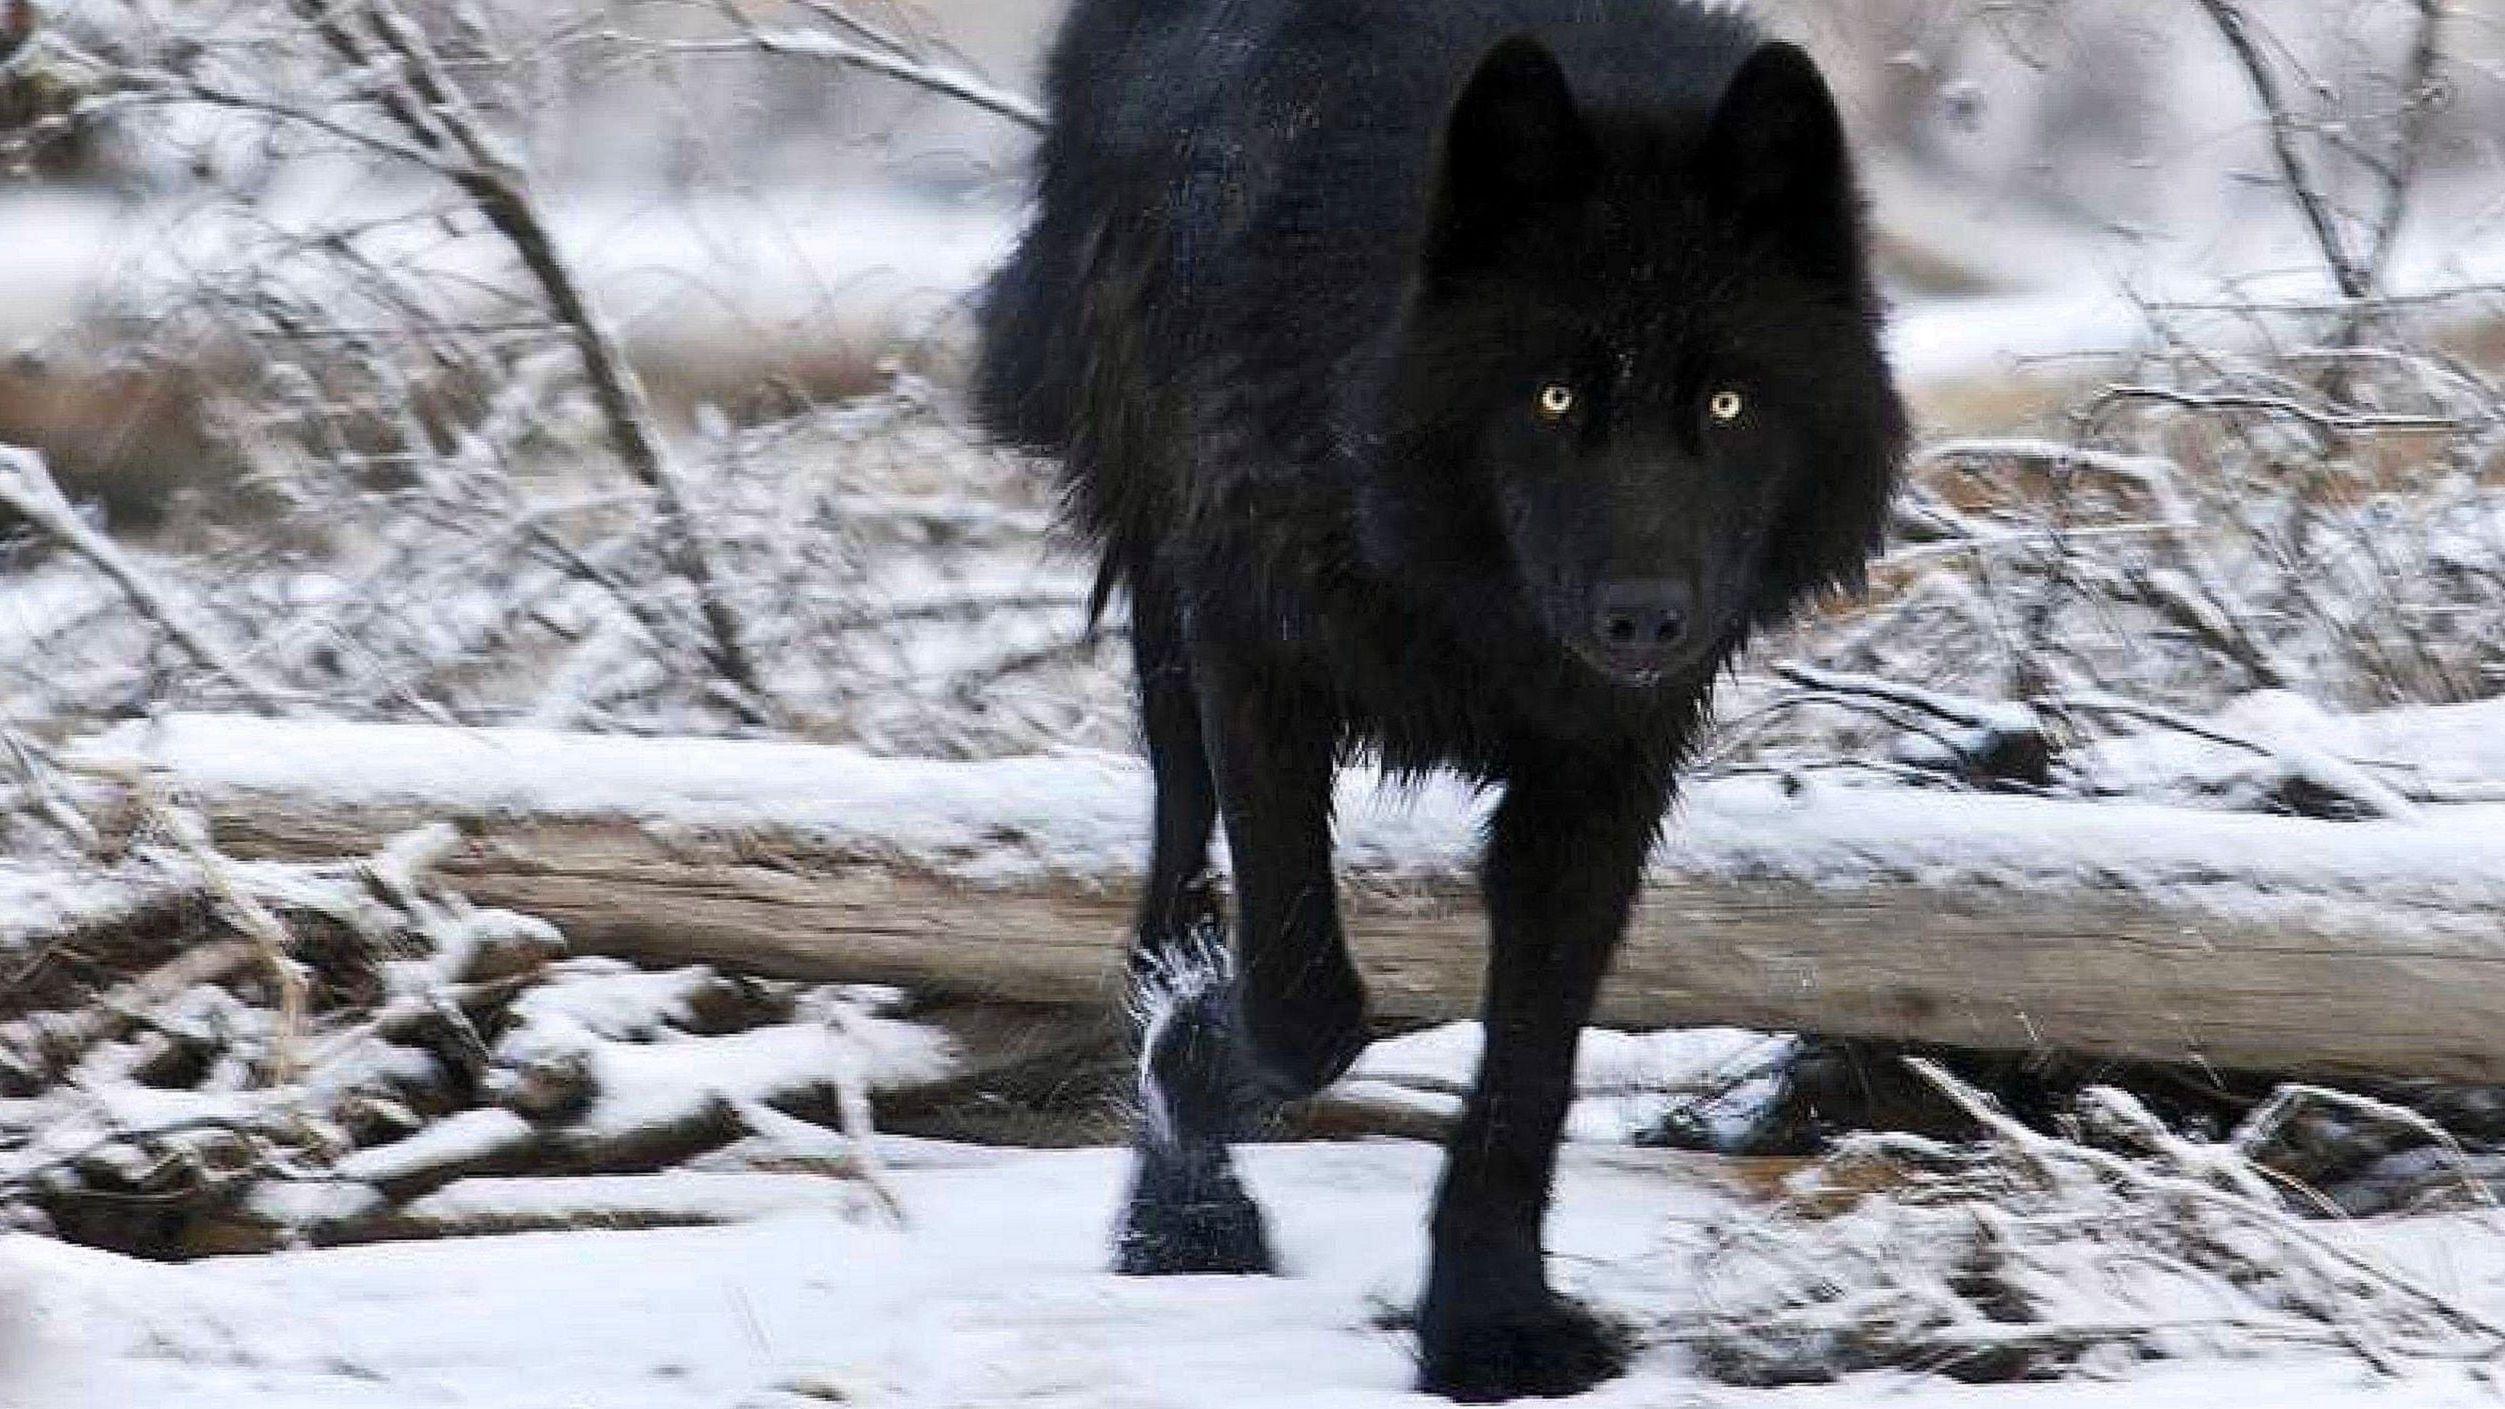 Black Wolf Wallpapers Ios Black Wolf Wallpapers Ios Black Wolf Wolf Wallpaper Wolf Black And White